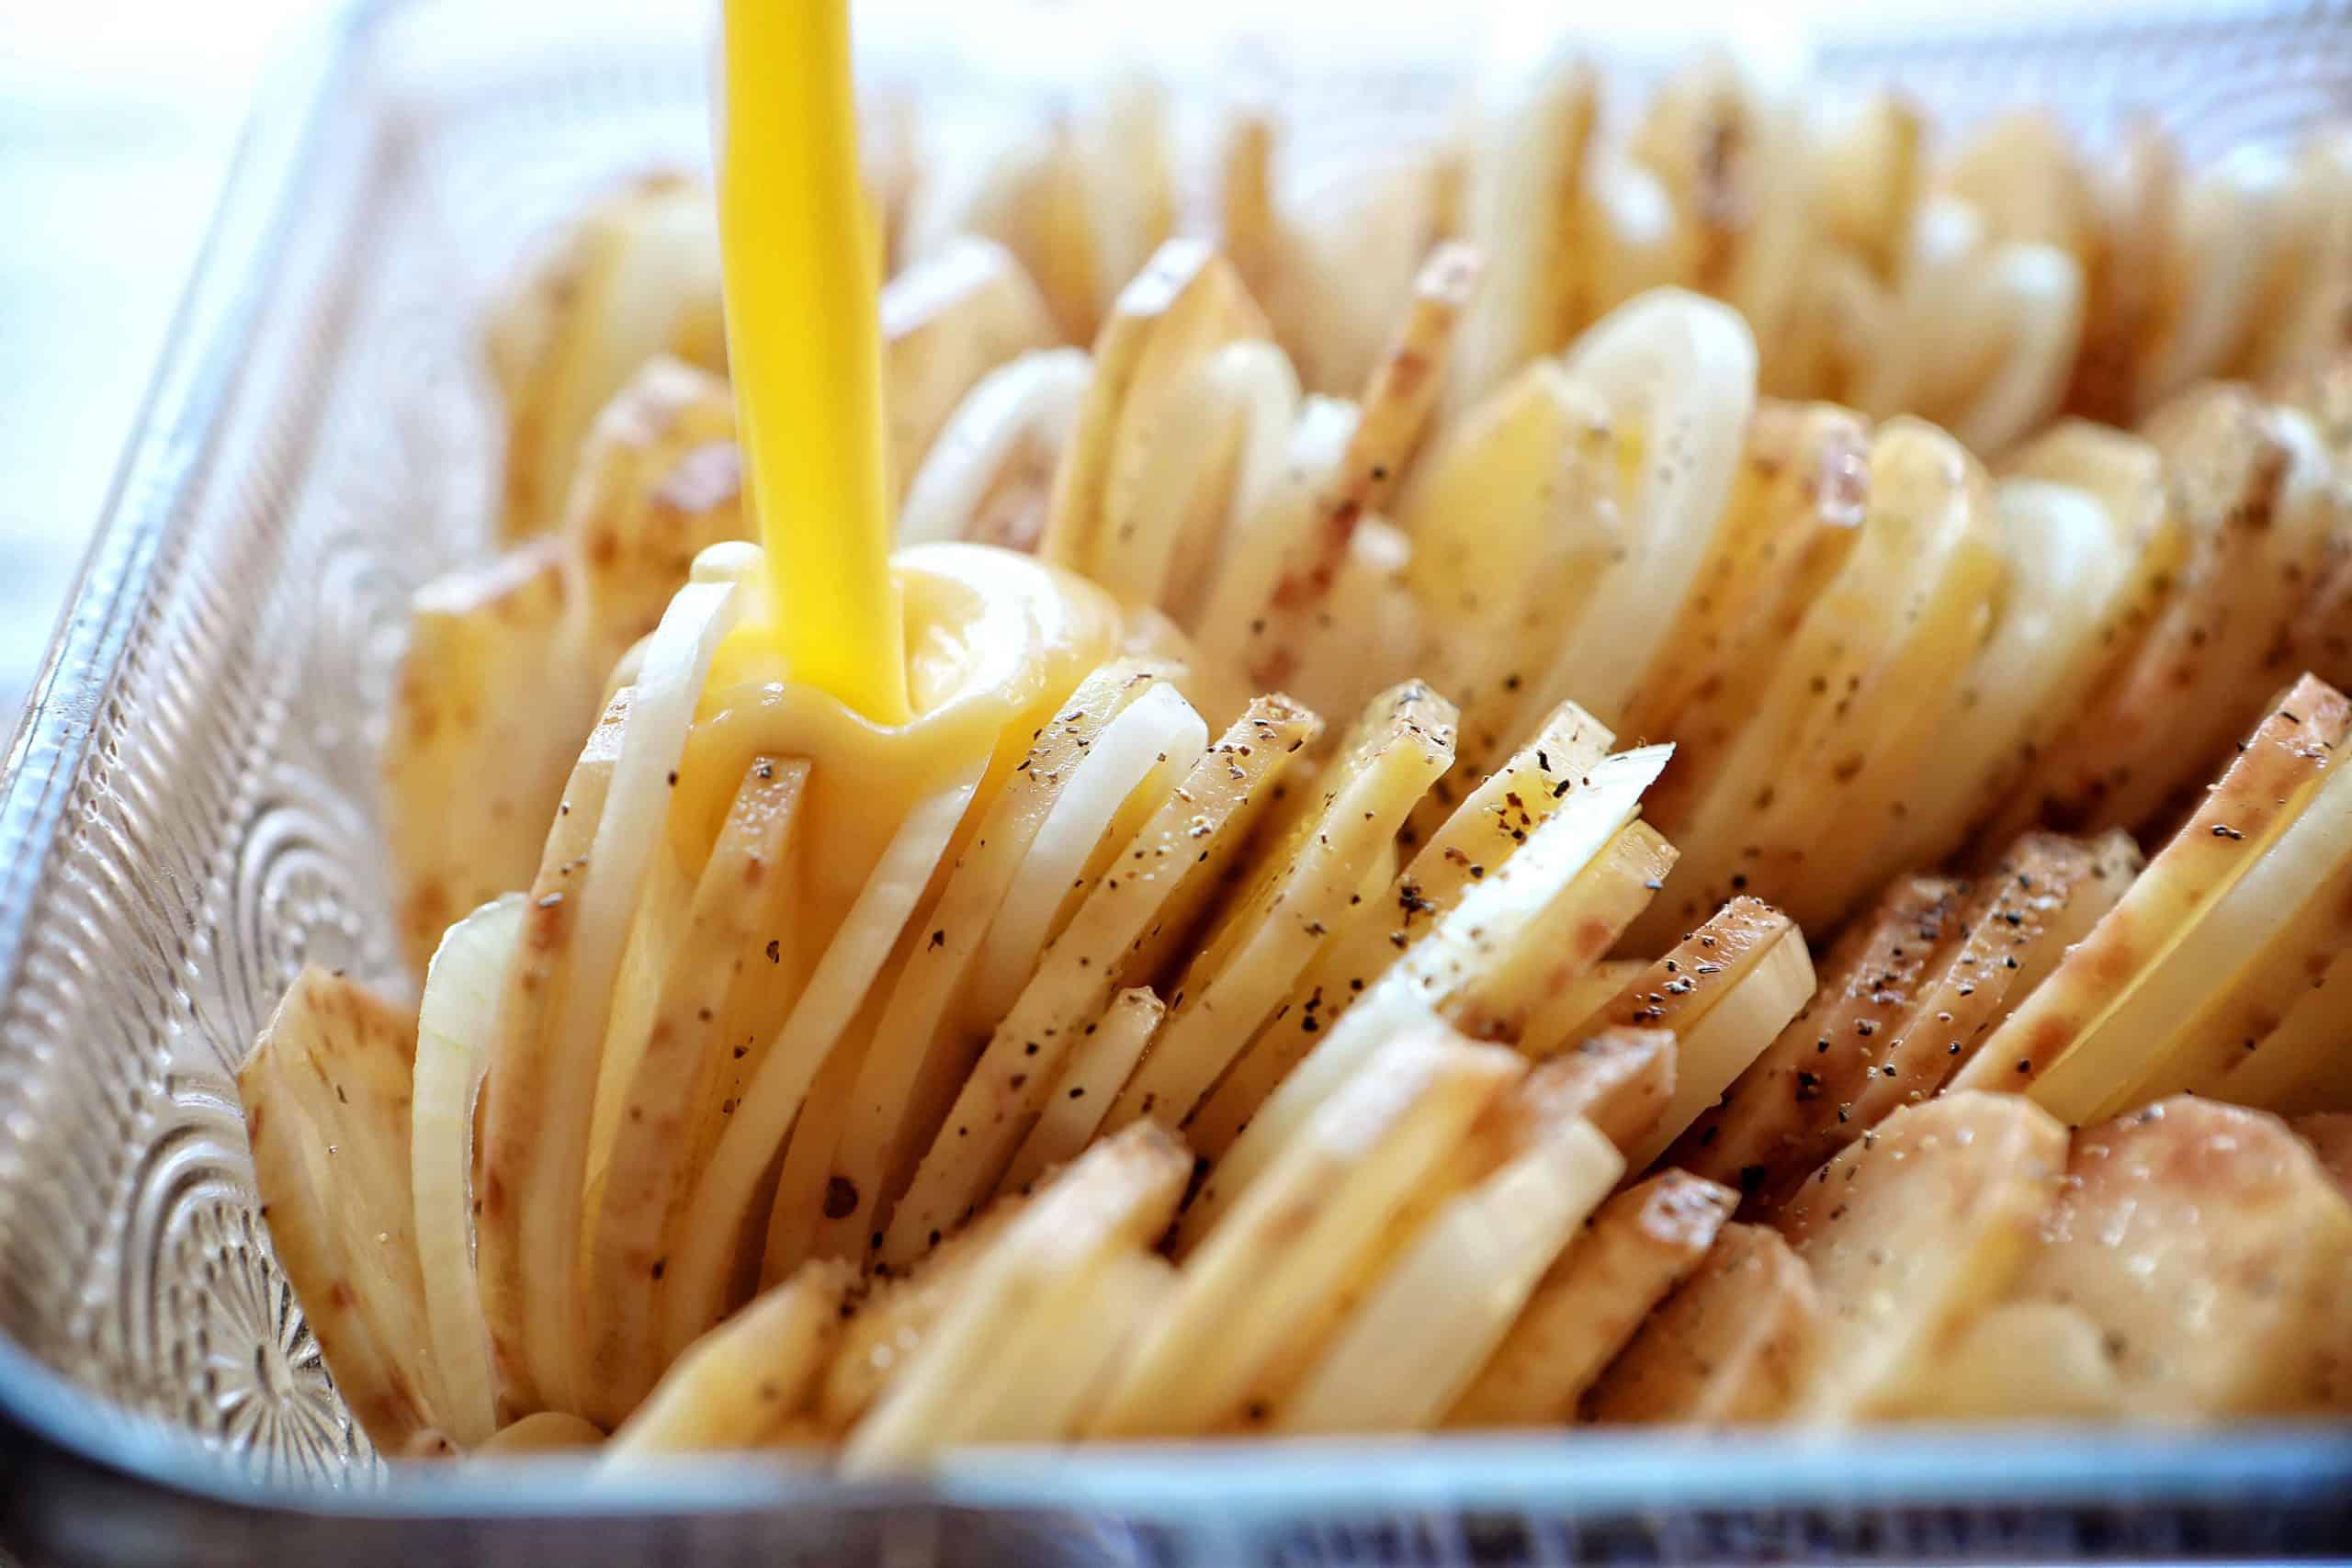 Cheesy Sauce for Au Gratin Potatoes